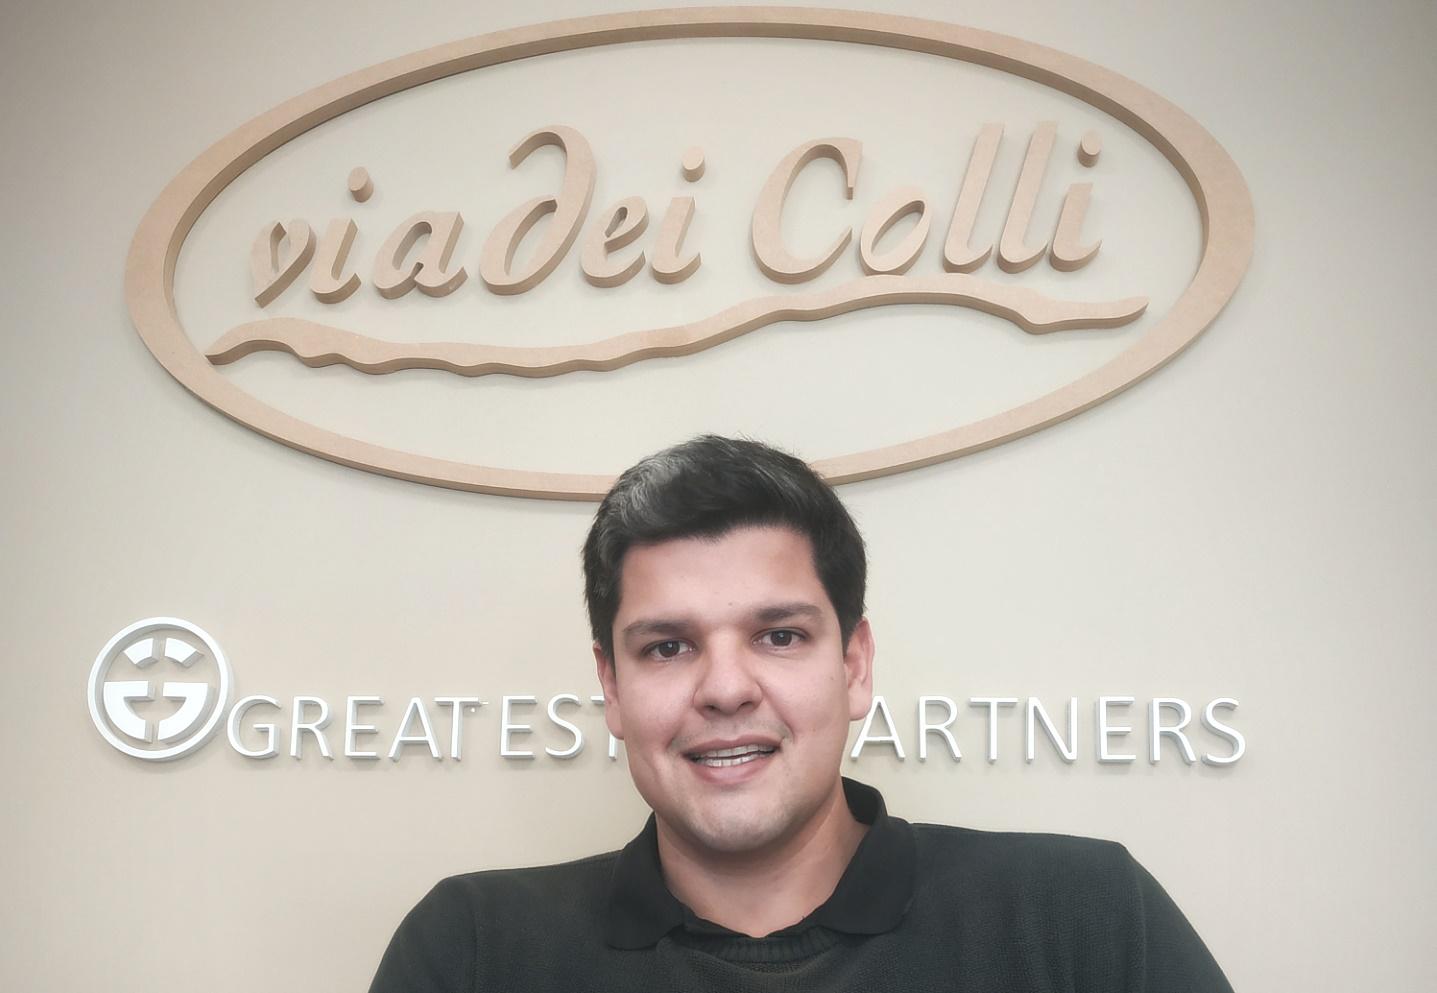 GE and Via Dei Colli: an excellent teamwork – our interview to Fabio Lima Battistini